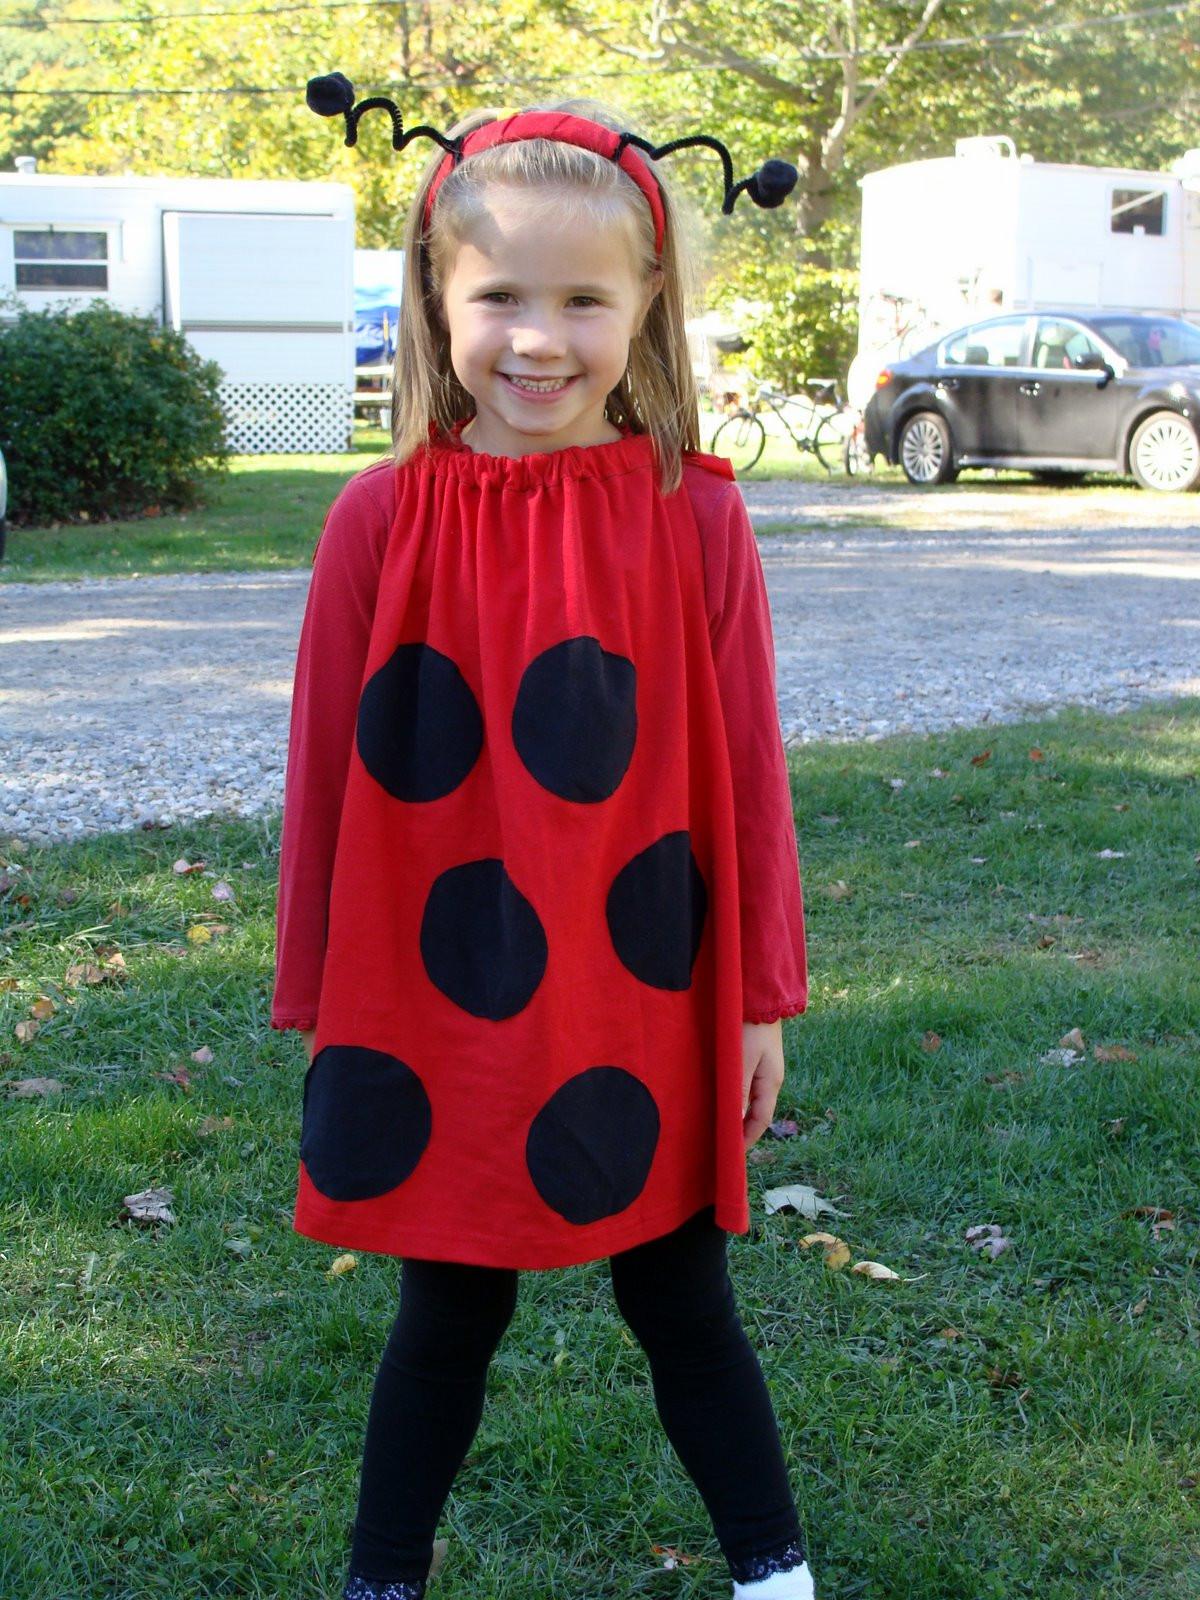 DIY Ladybug Costume  7 All To her Super Easy LadyBug Costume